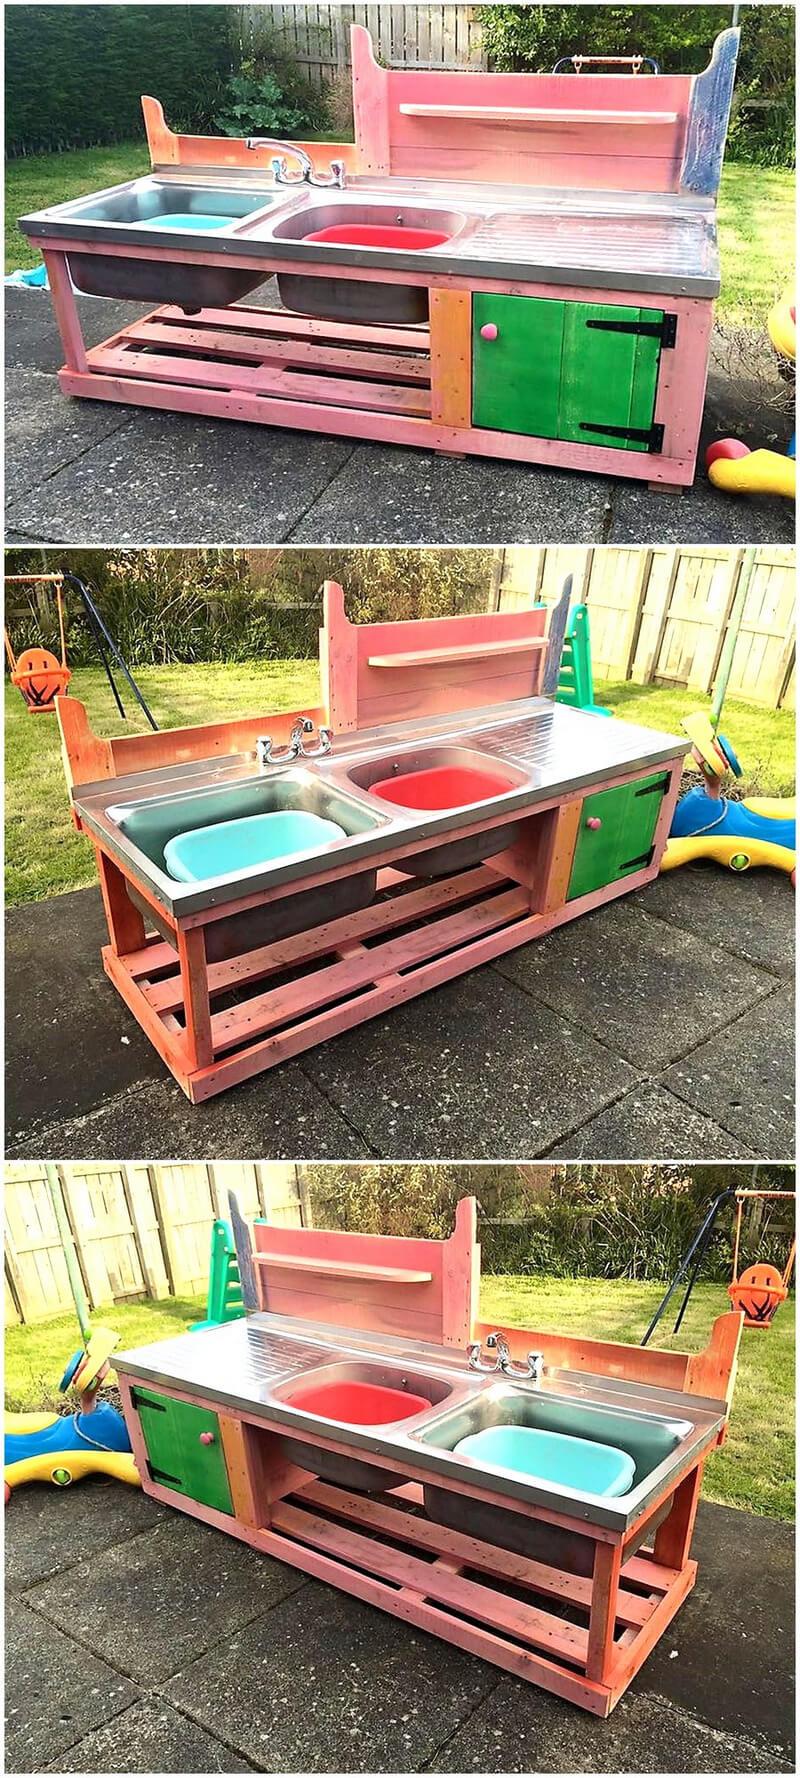 kids mud kitchen made with pallets